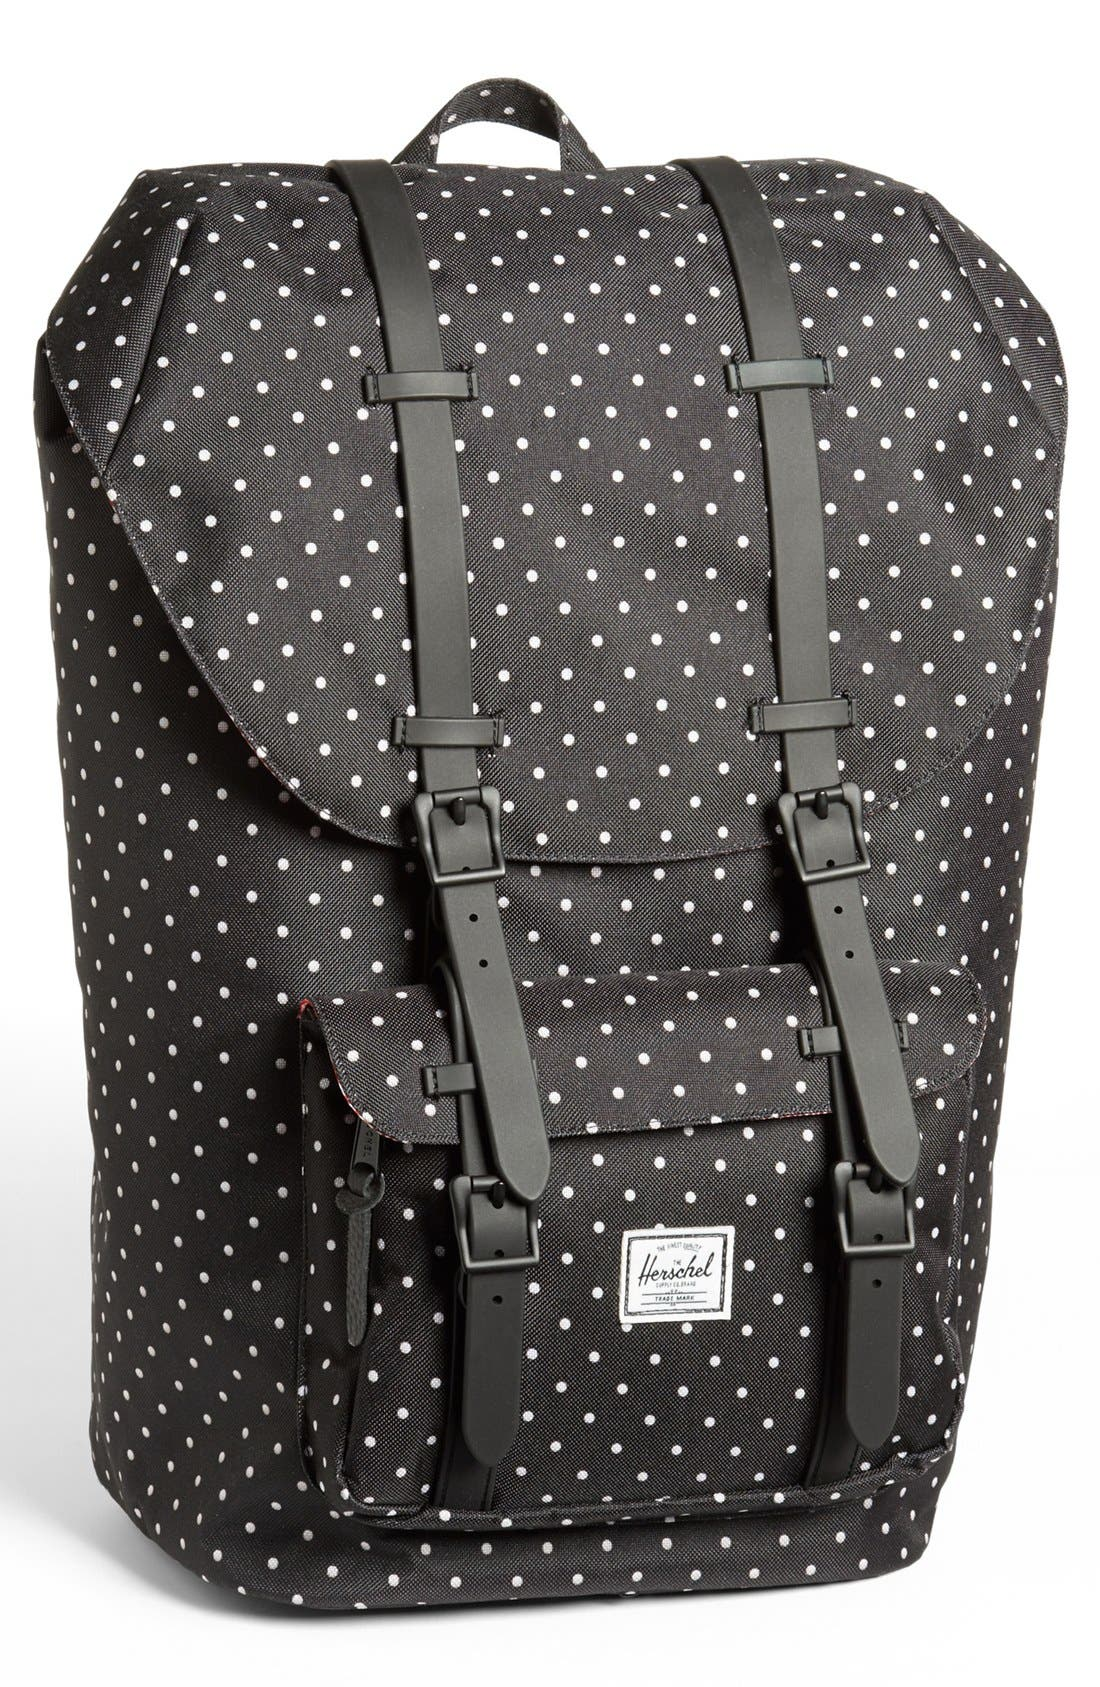 Main Image - Herschel Supply Co. 'Little America' Backpack